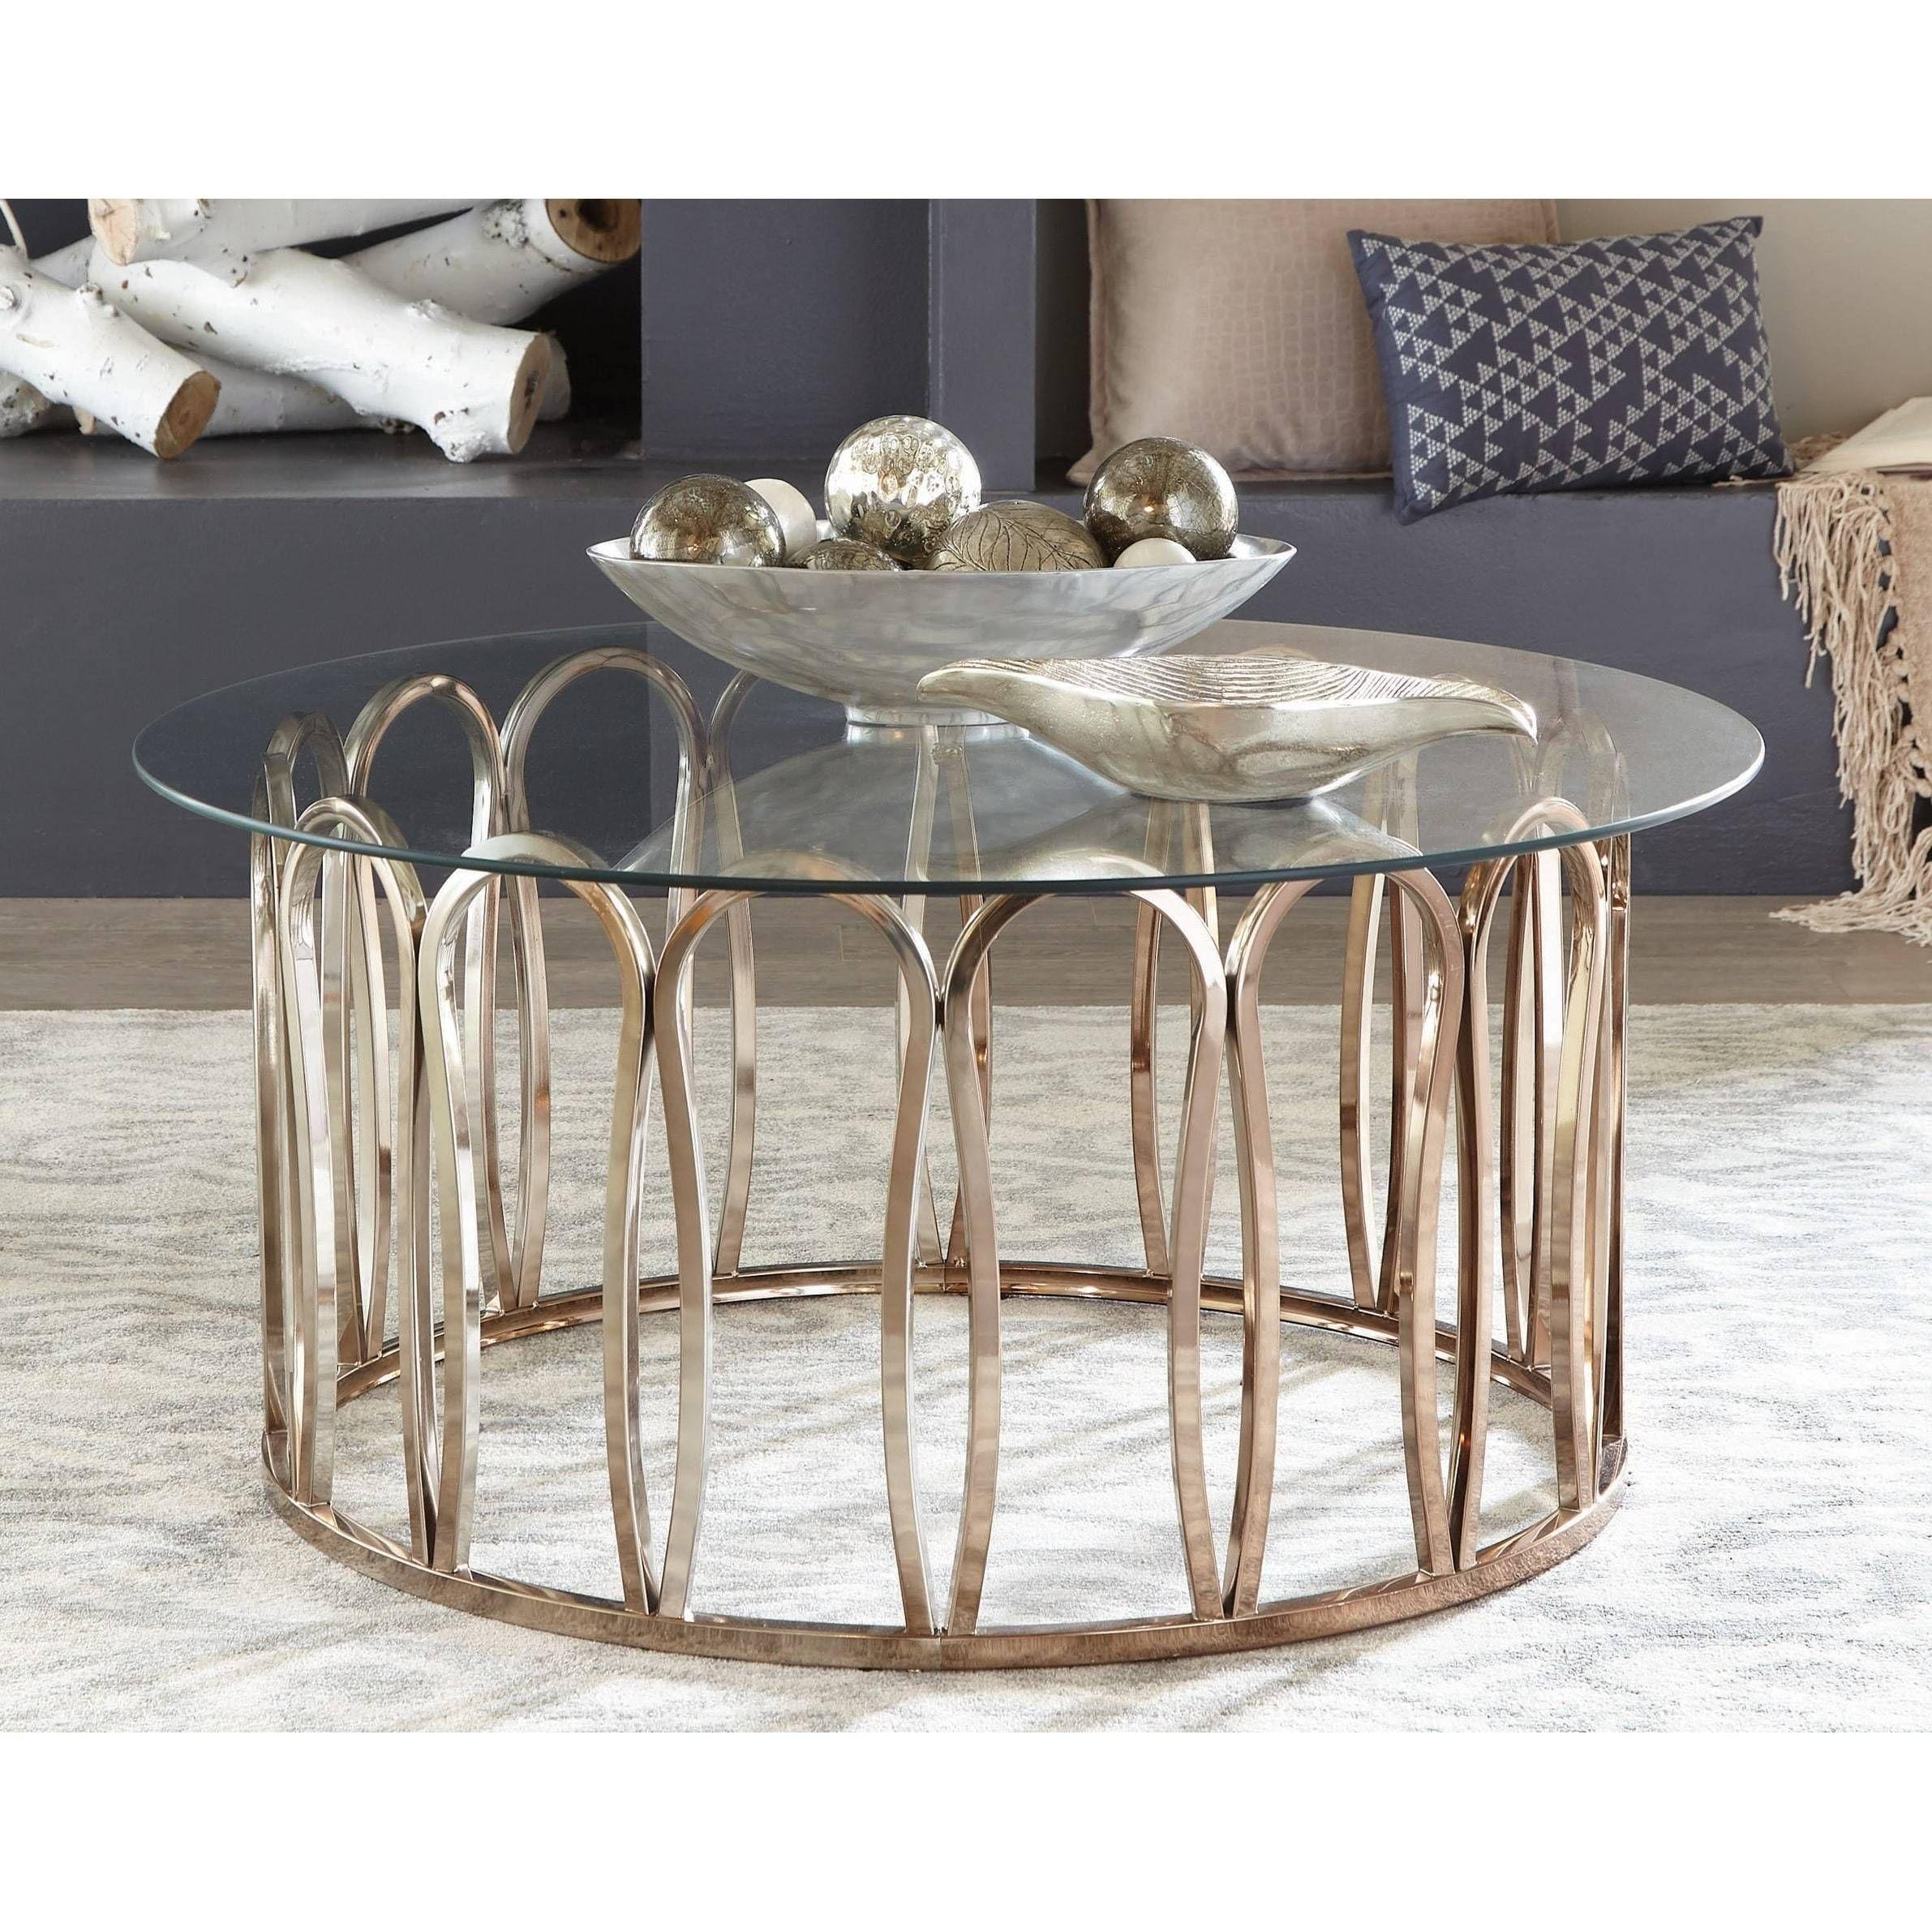 Google Image Result For Https Www Thestoreinteriors Co Uk Wp Content Uploads 2019 06 Levanto Coffe Coffee Table Marble Coffee Table Round Coffee Table Modern [ 1000 x 1000 Pixel ]